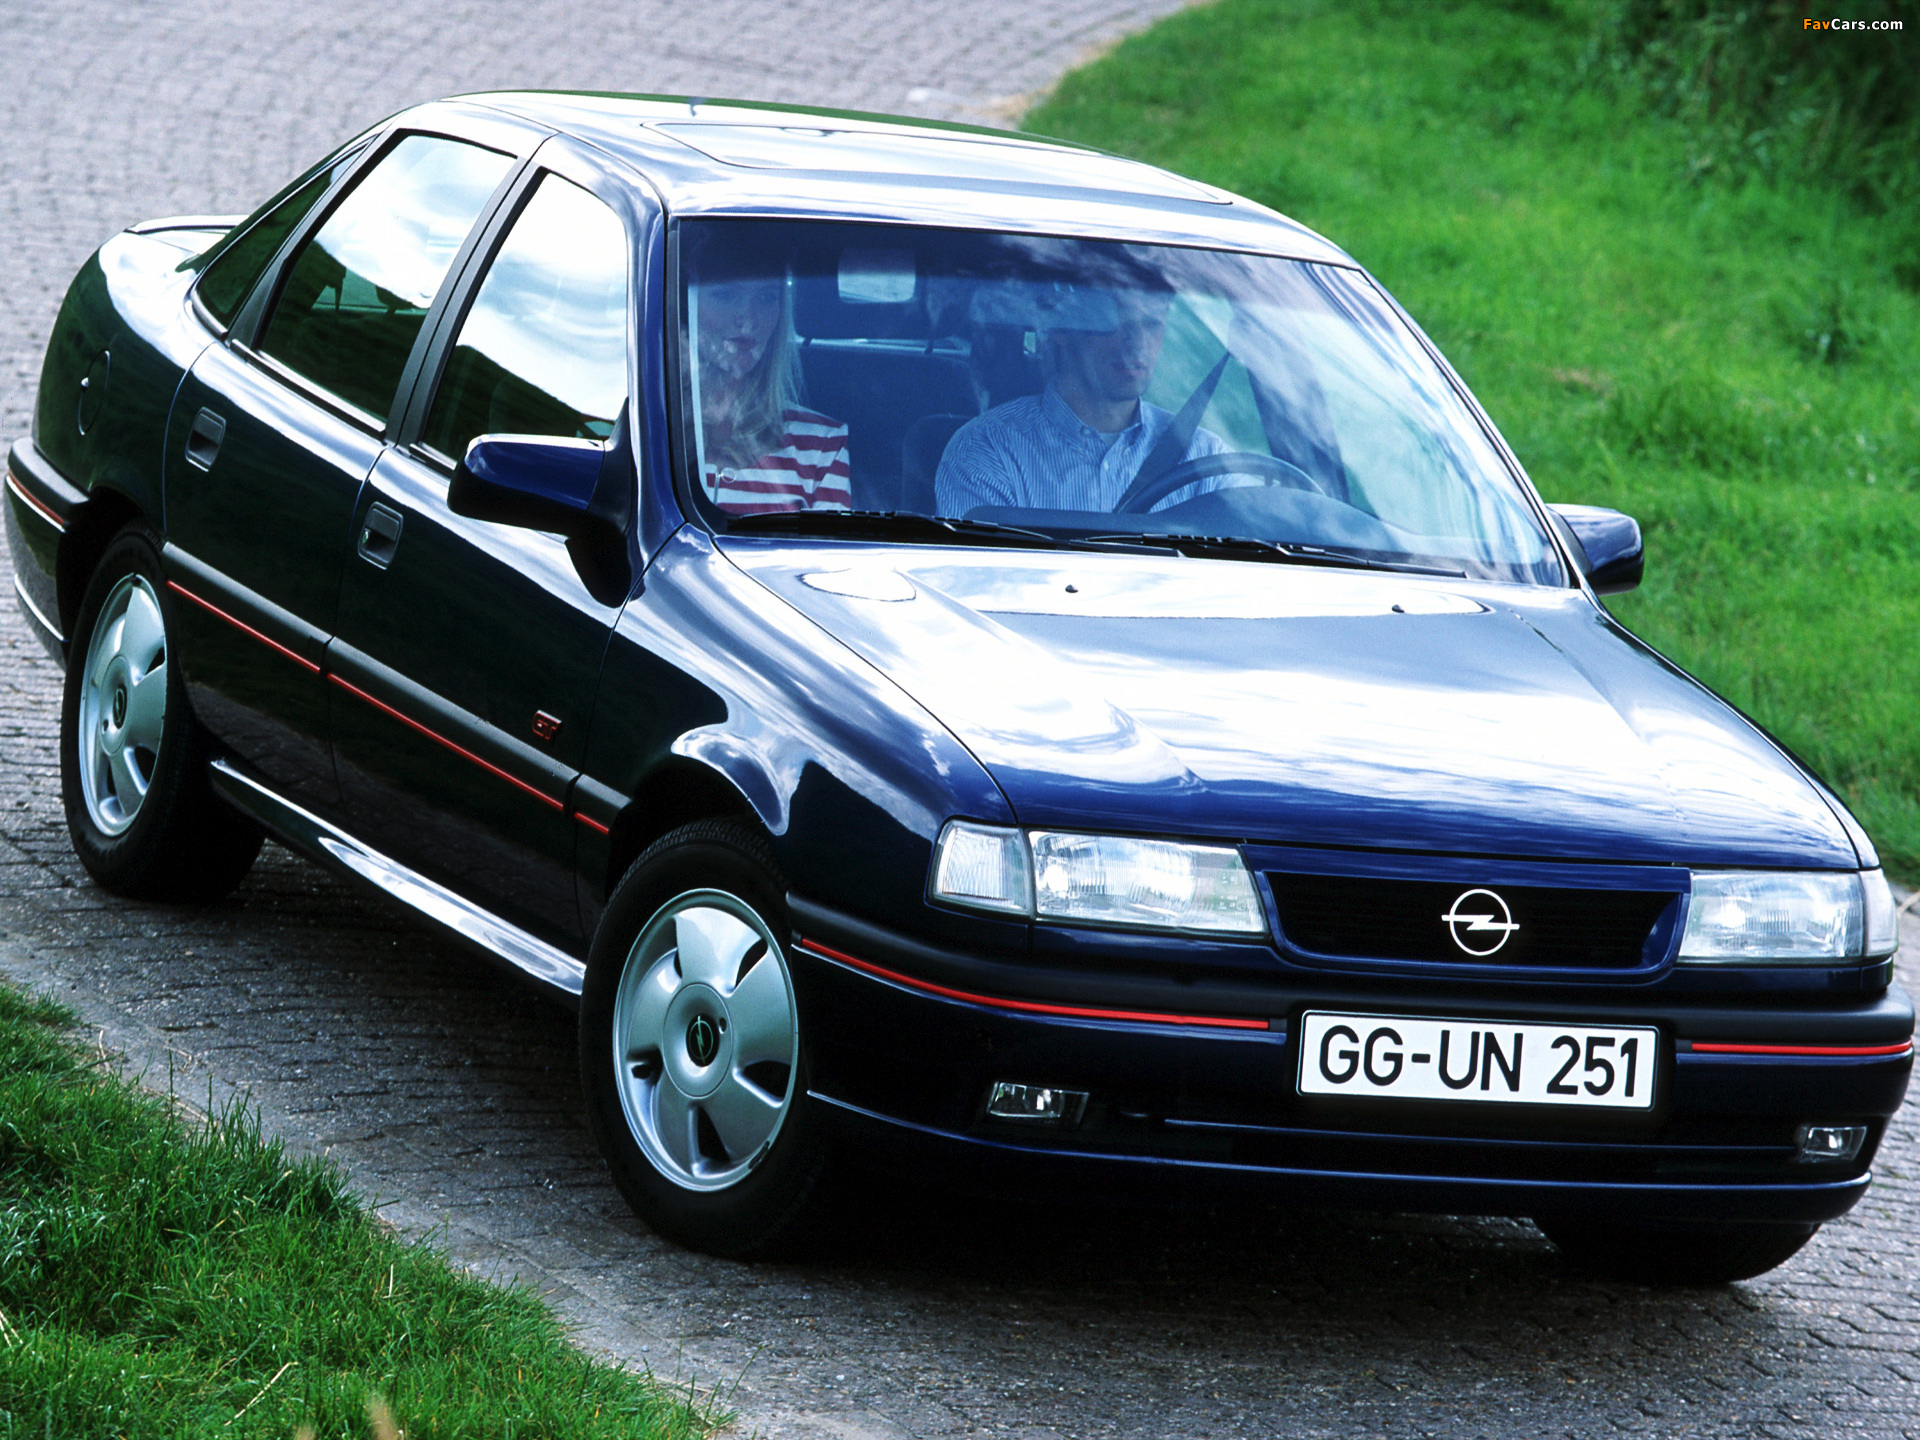 Opel Vectra Sedan on 1999 Acura Coupe Models